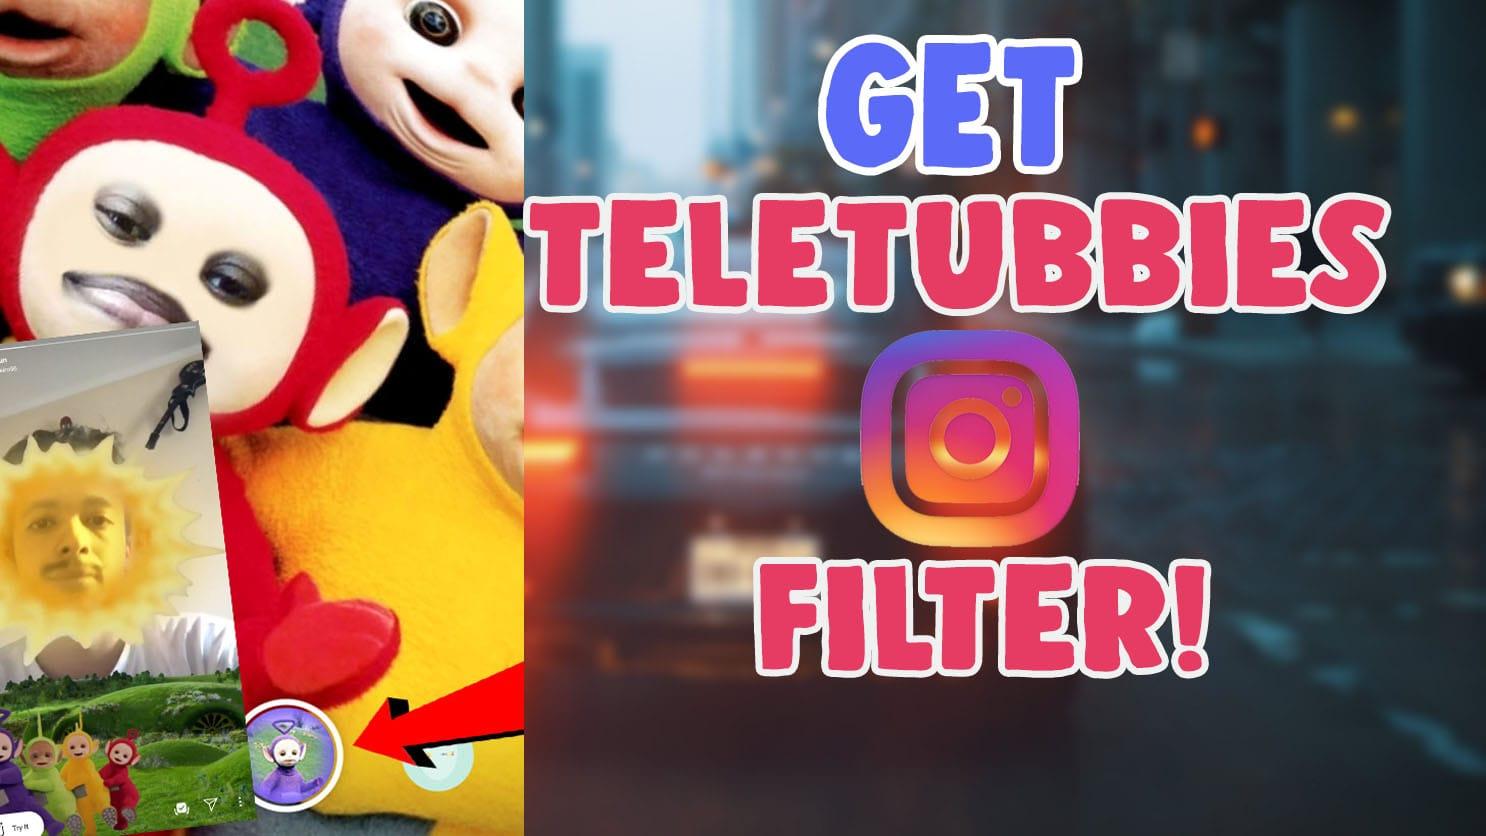 teletubbies sun instagram filter and tiktok